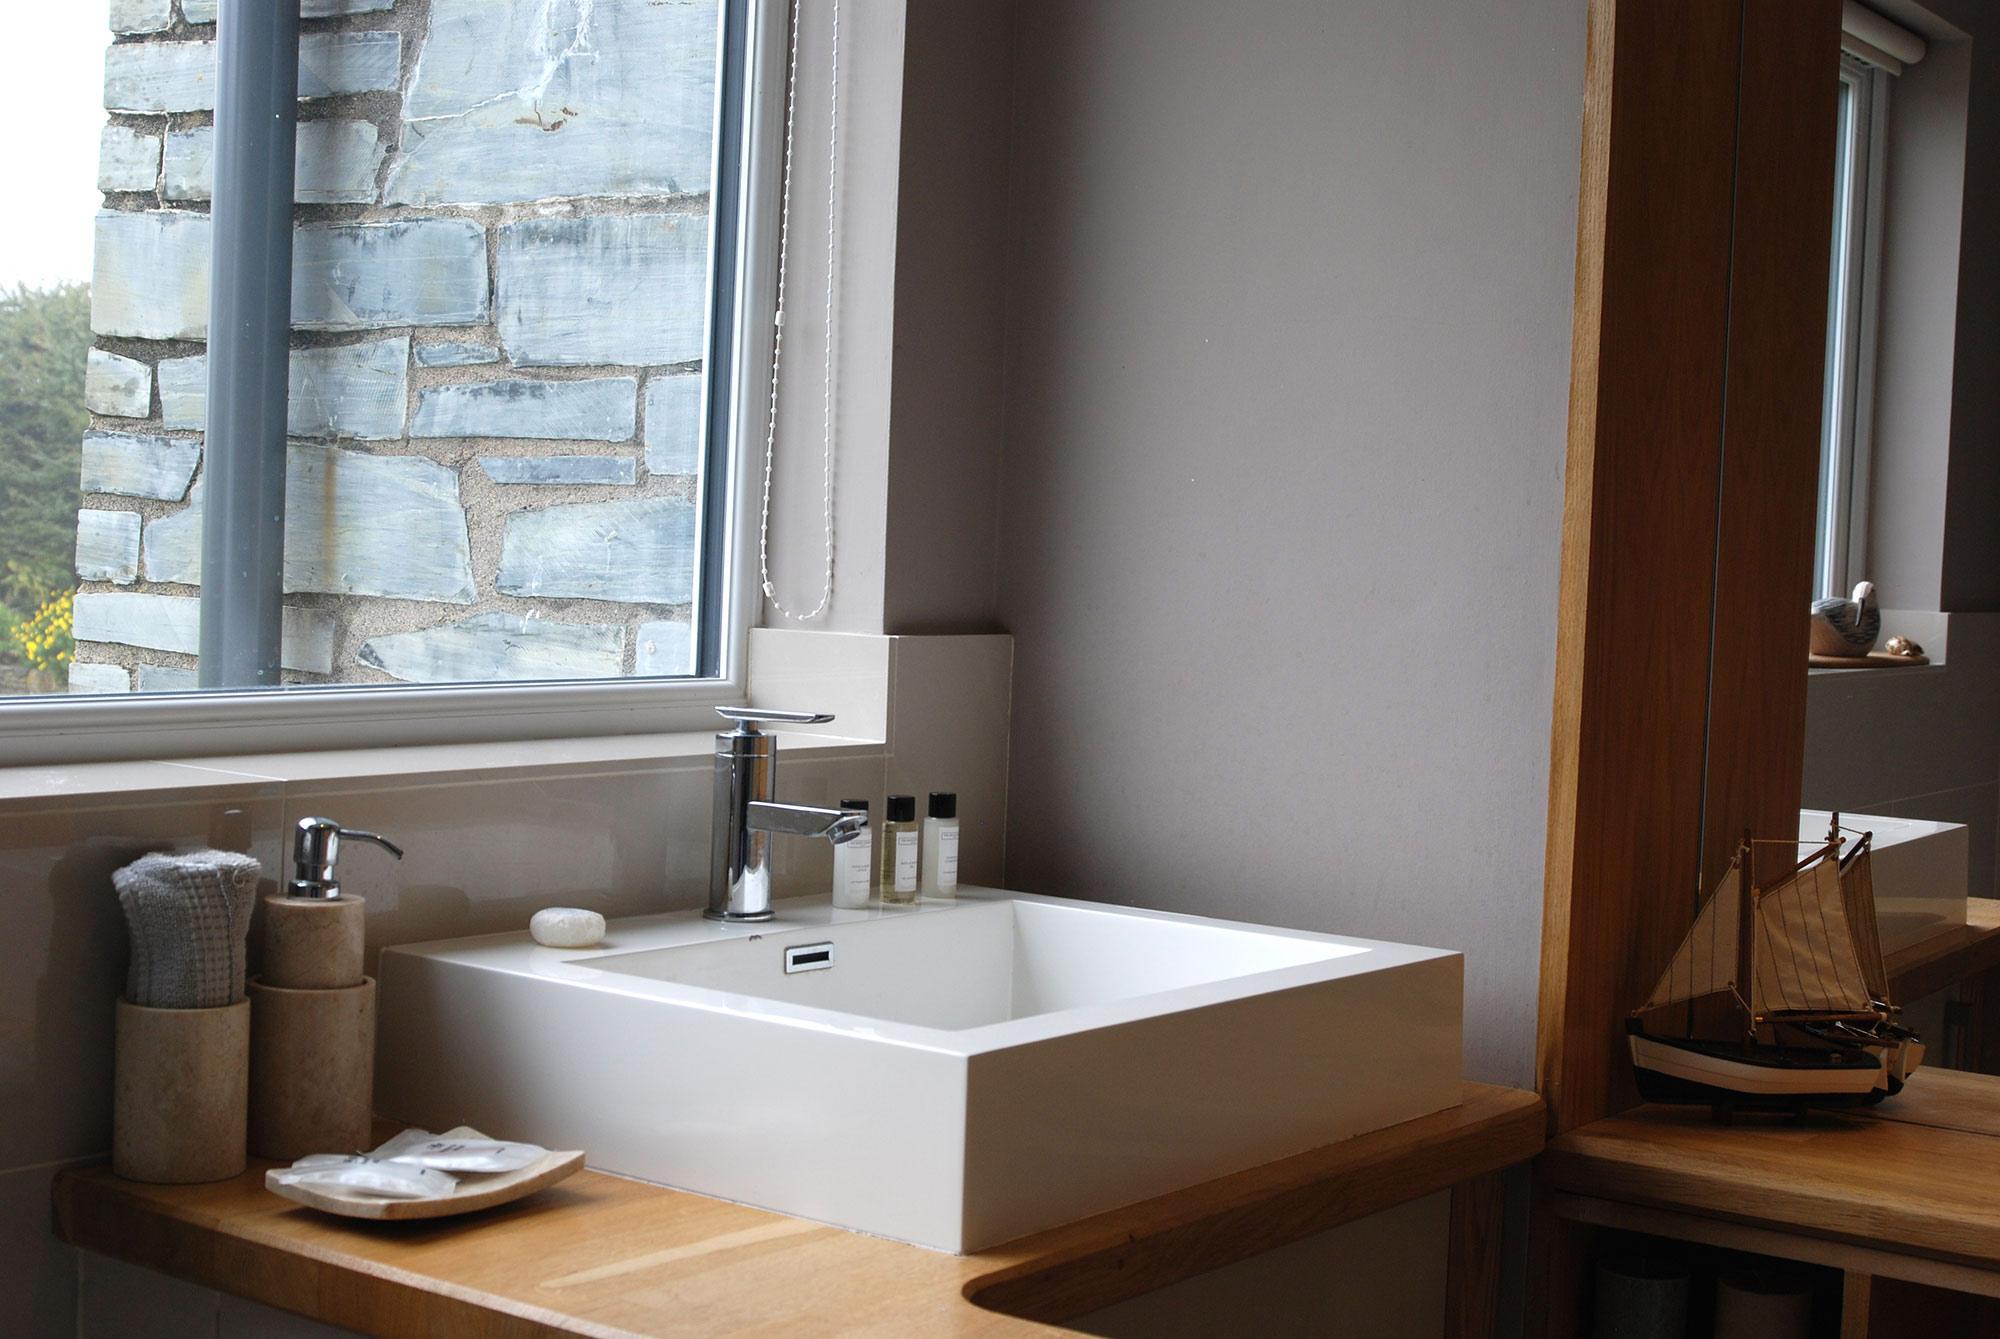 Building Modernization at Gwelanmor bathroom 1